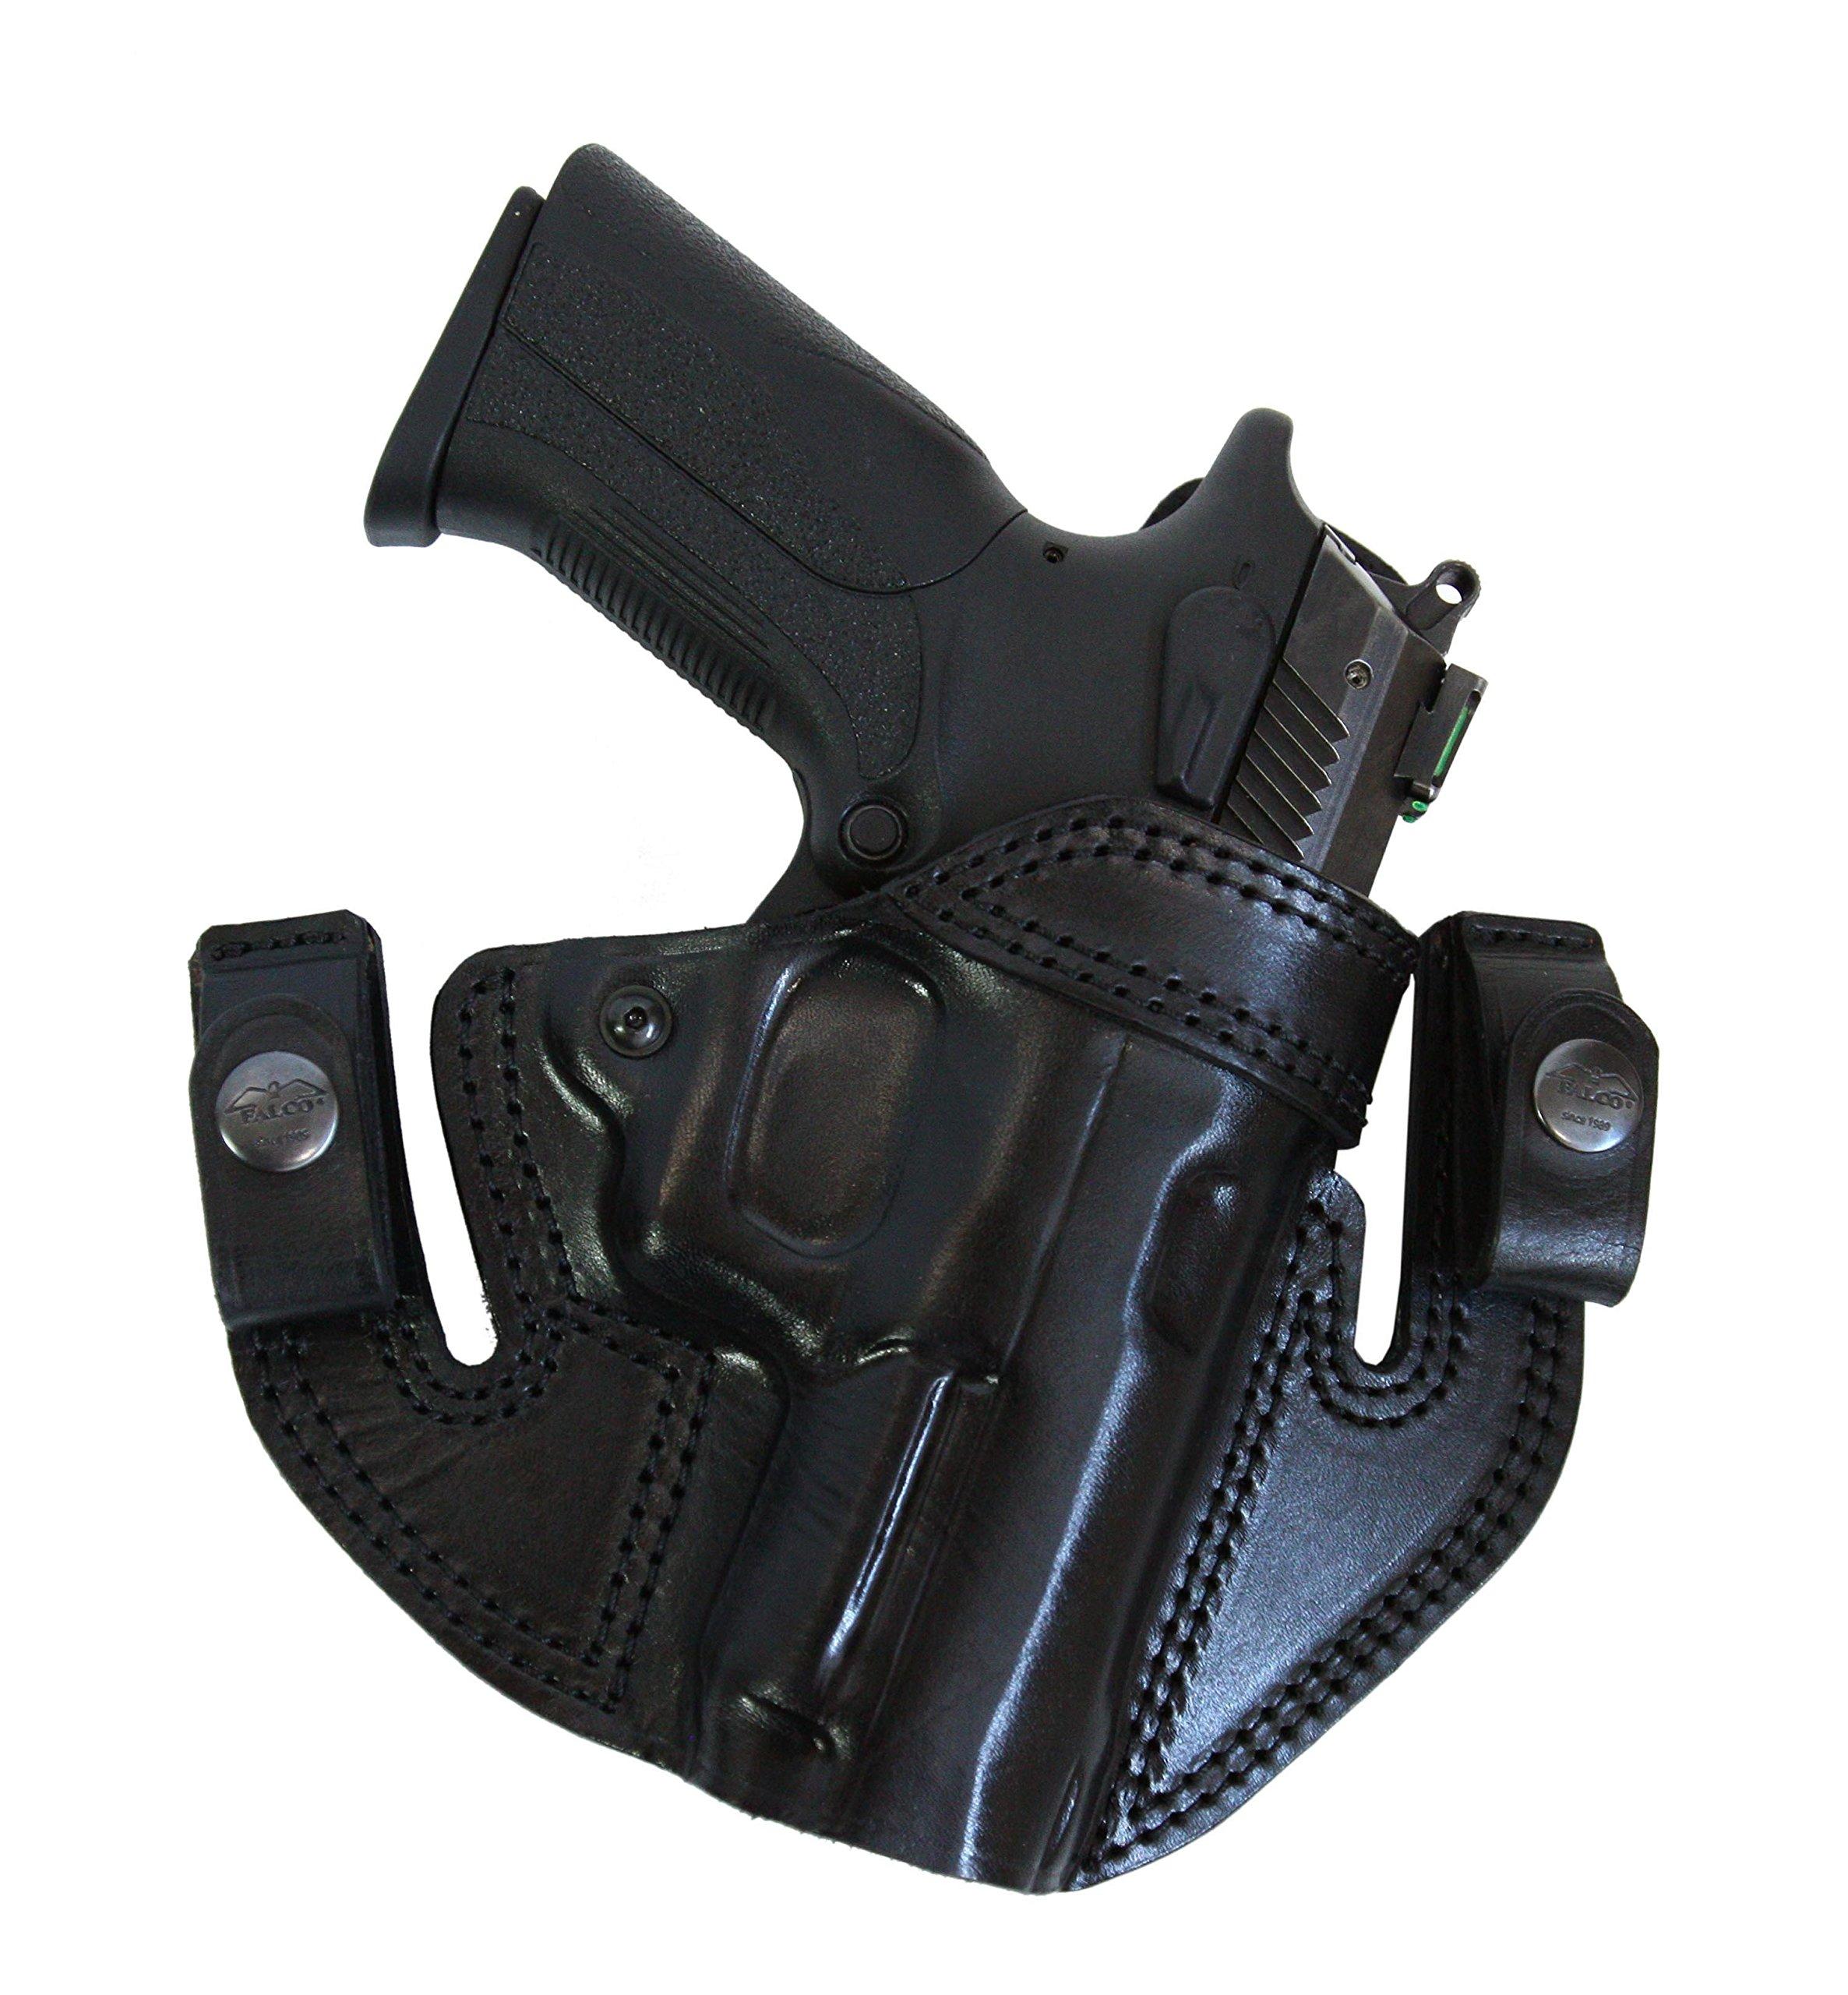 Beretta 92FS IWB Leather Holster